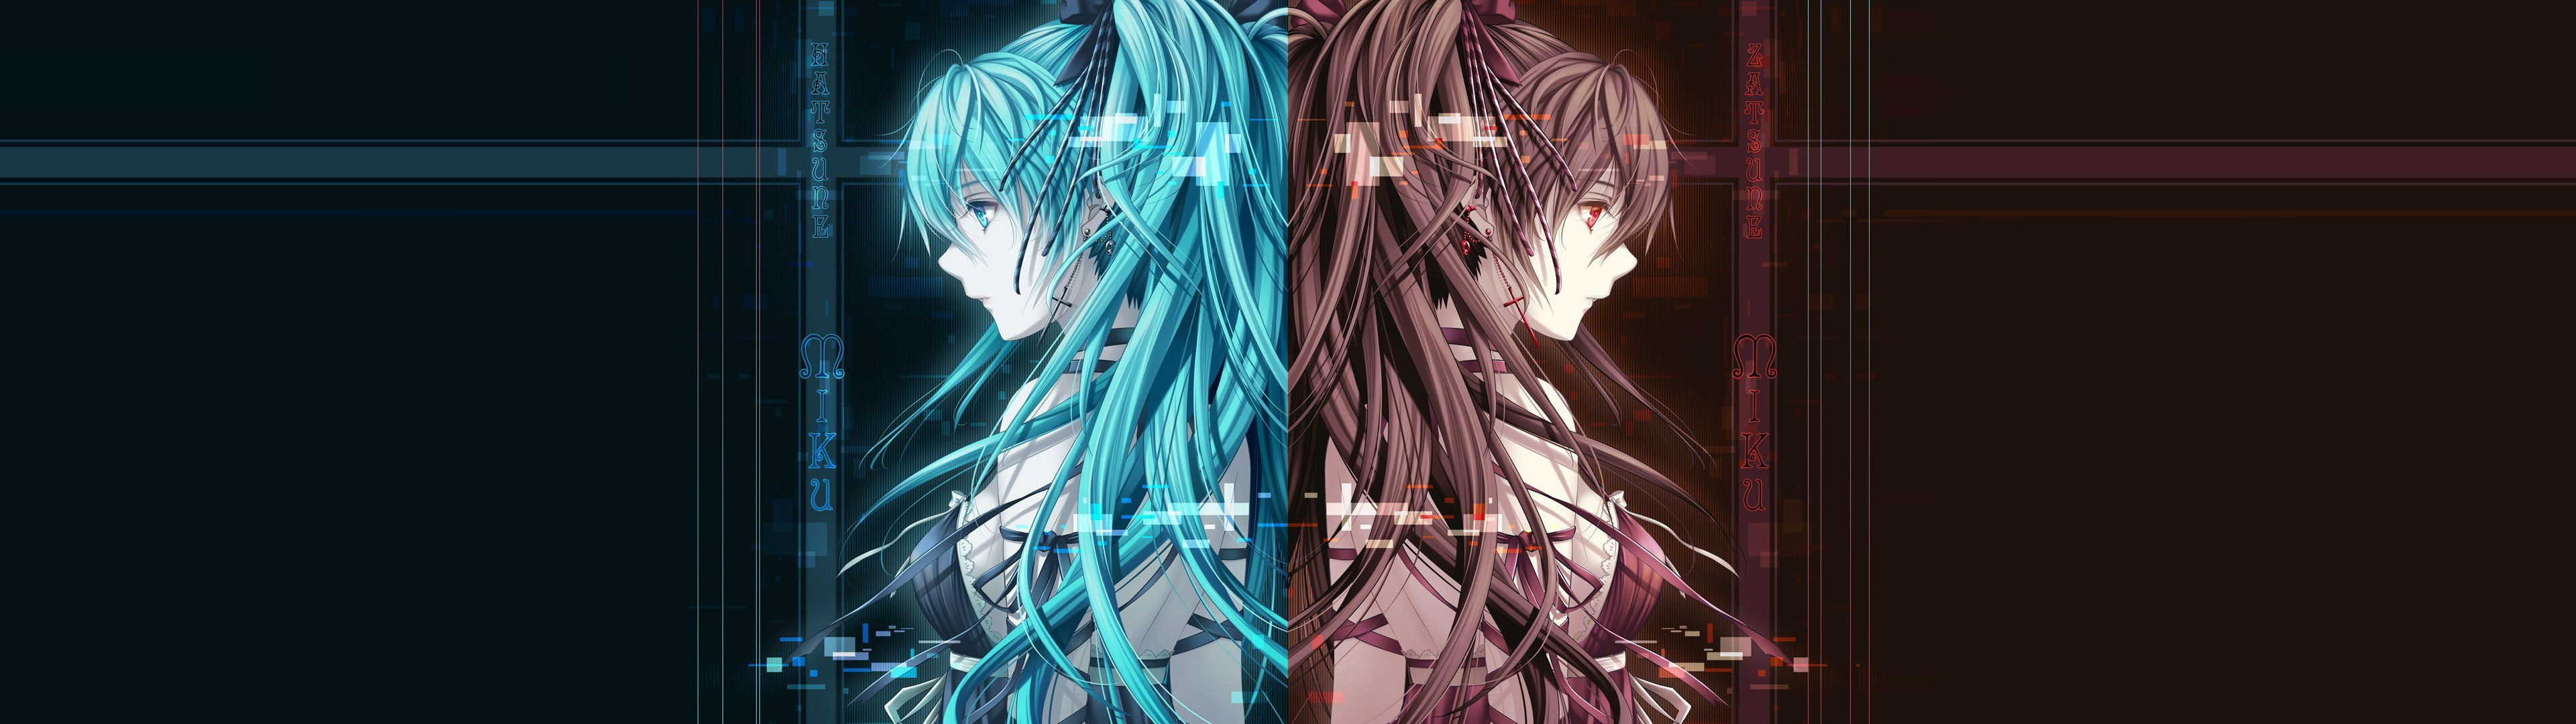 [49+] Dual Monitor Anime Wallpaper on WallpaperSafari